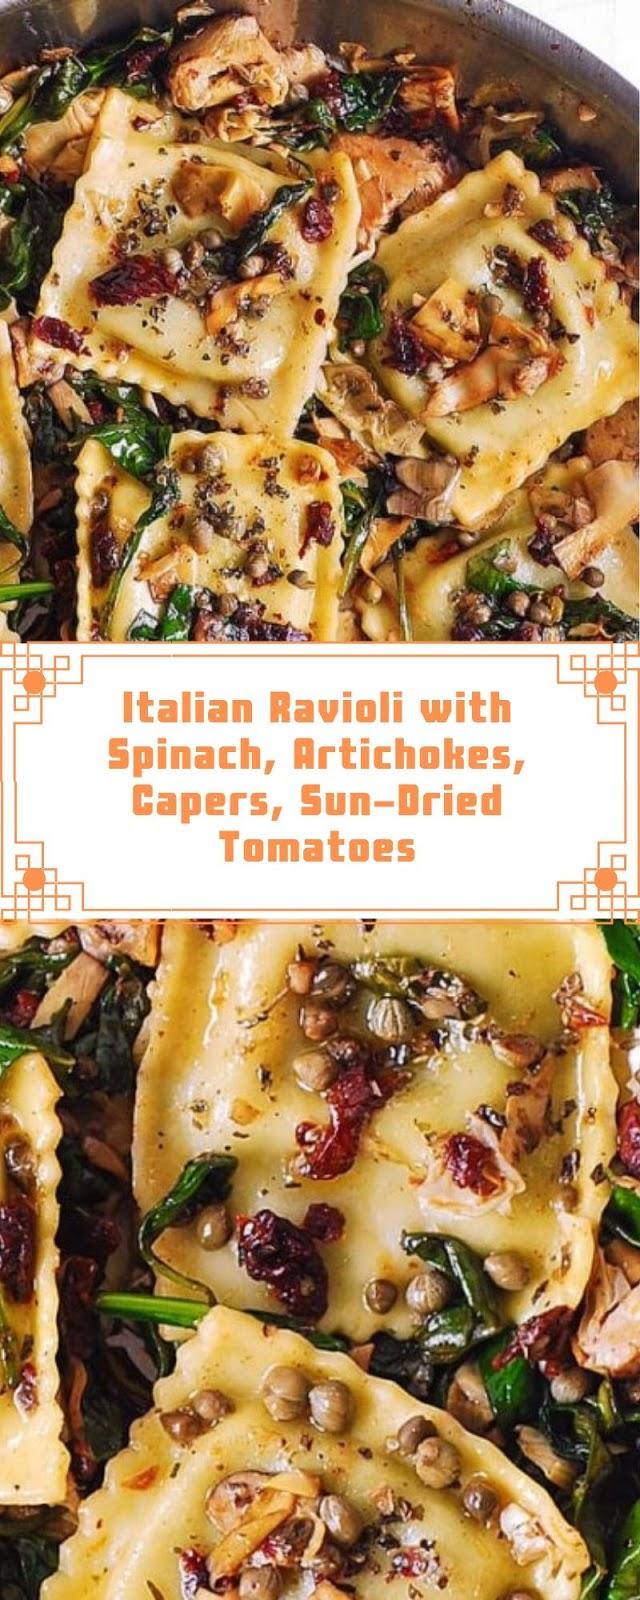 Italian Ravioli with Spinach, Artichokes, Capers, Sun-Dried Tomatoes